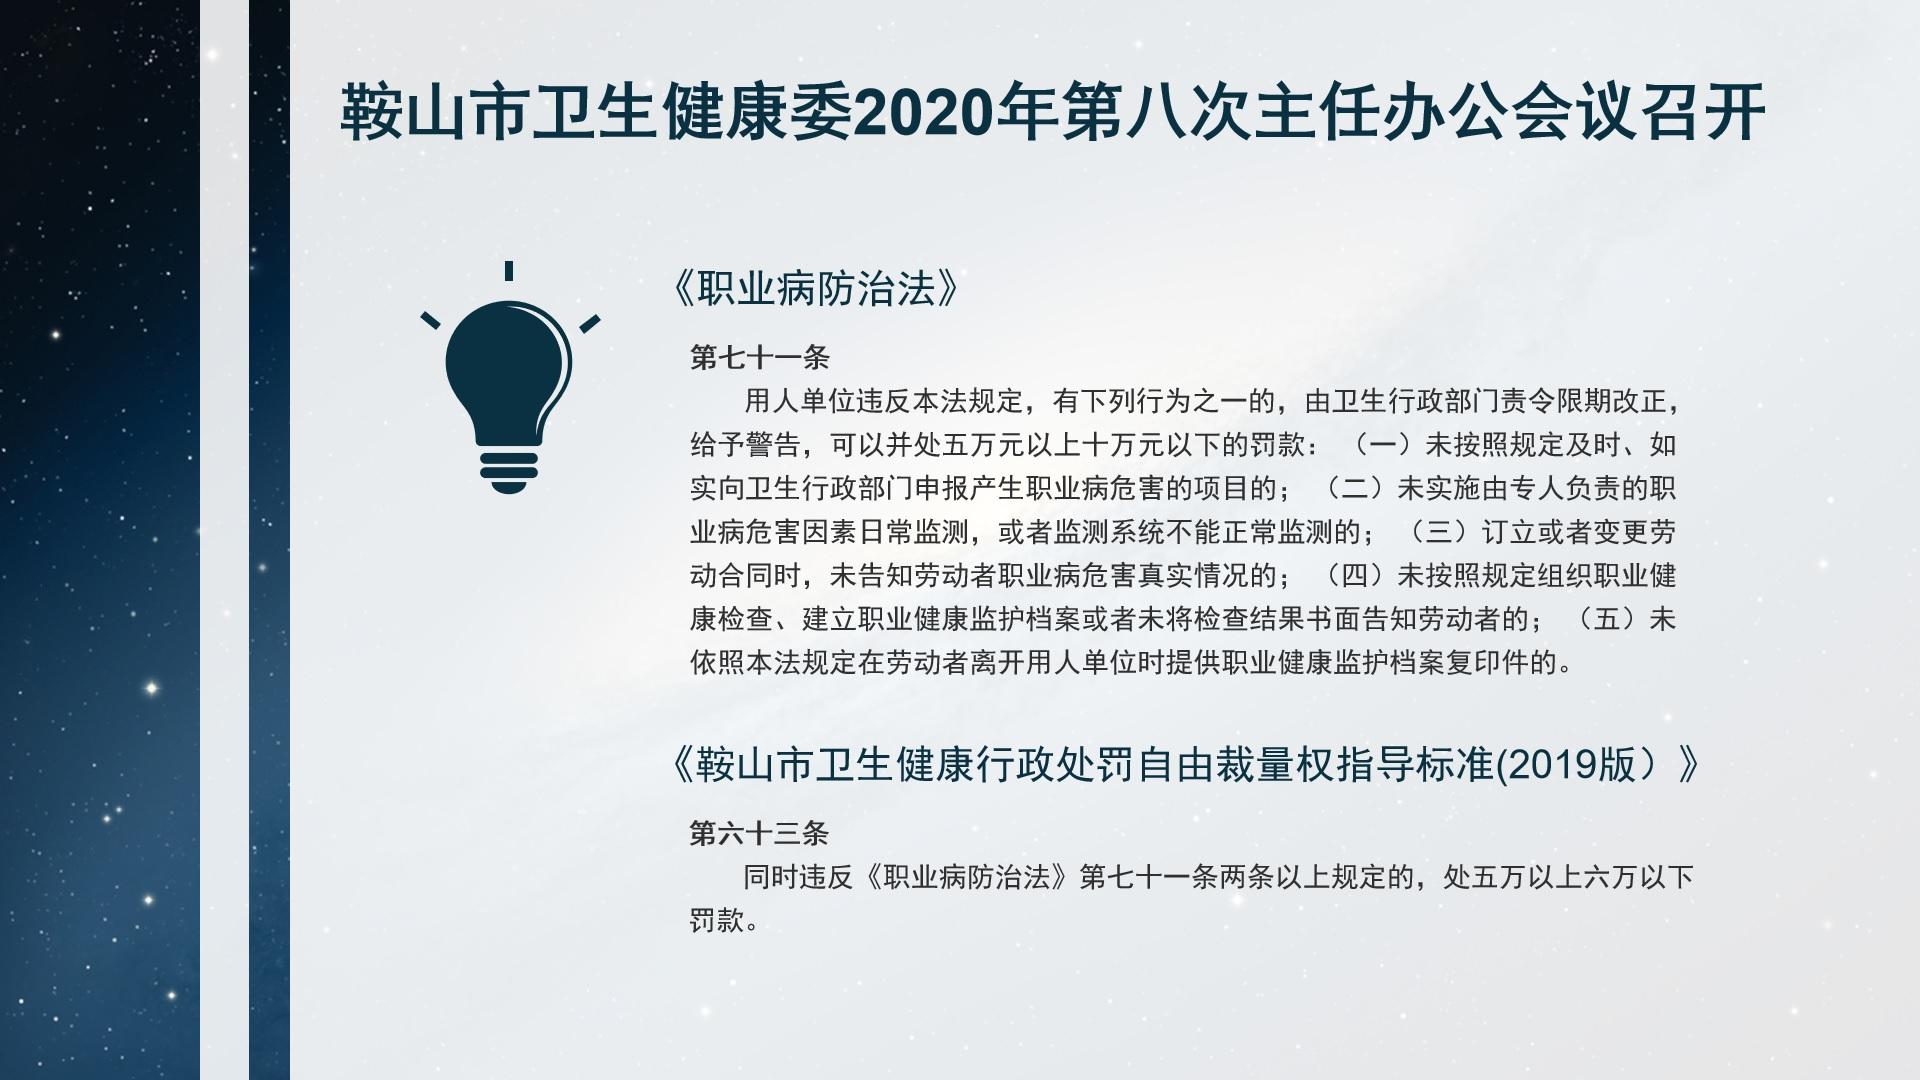 C:UsersLNDesktop\u516c开材料\u4e3b任办公会'0年主任办公会议(图)\u978d山市卫生健康委2020年第八次主任办公会议召开.jpg